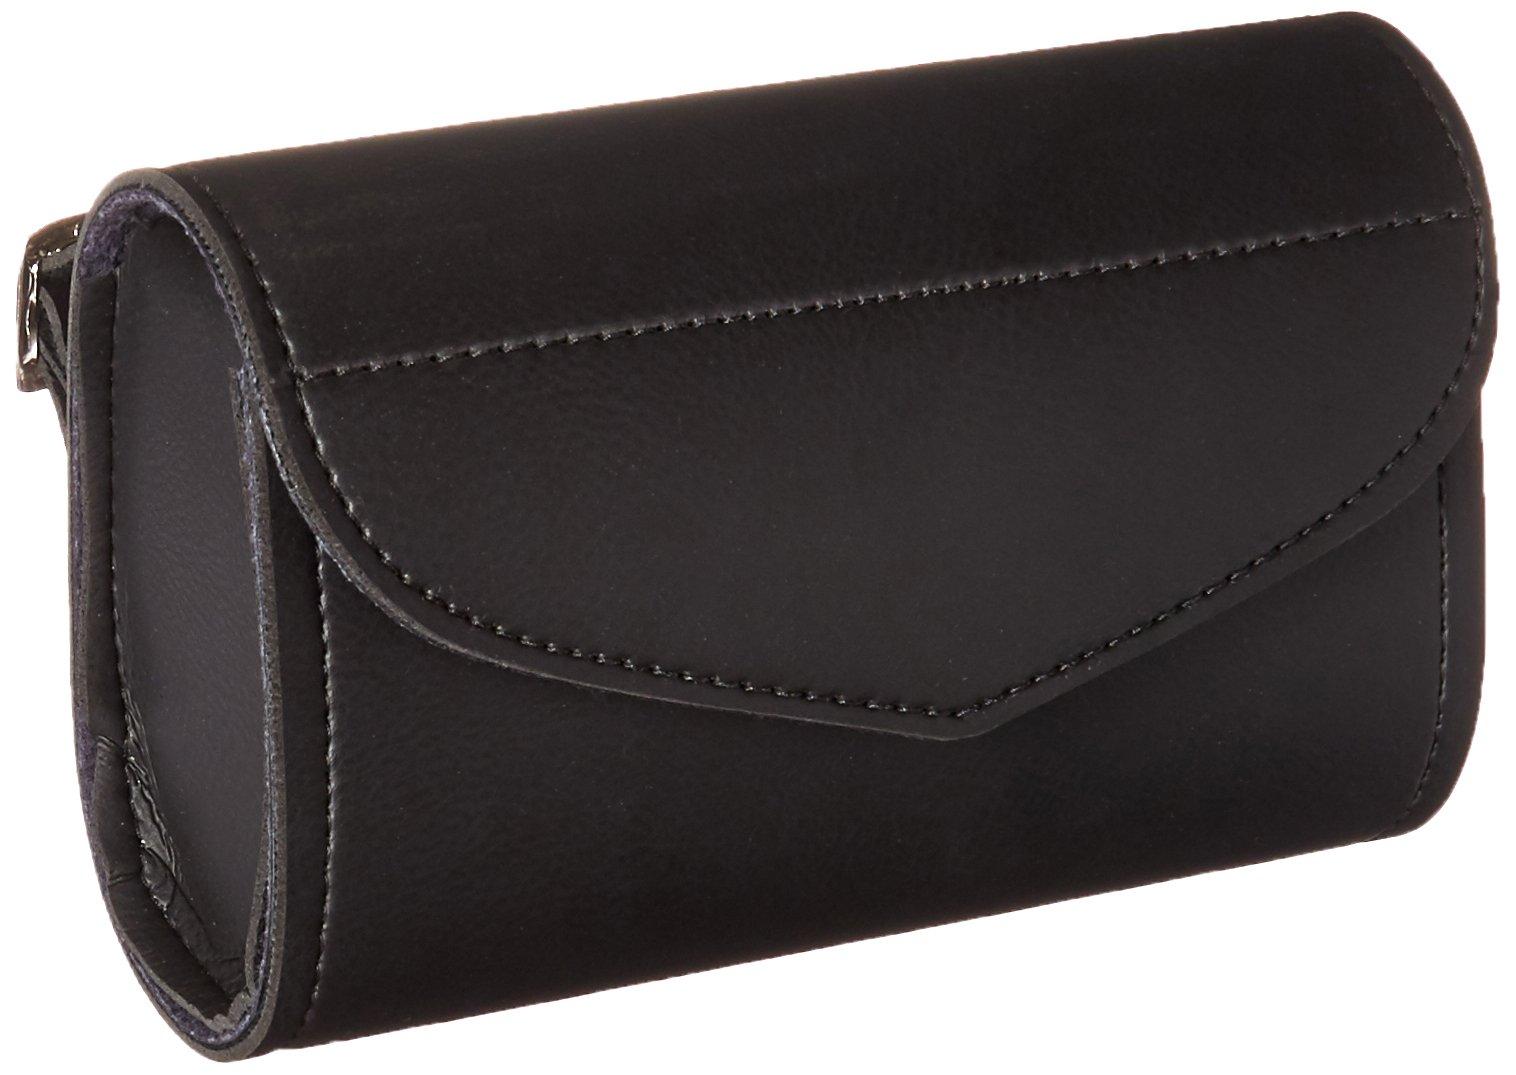 Shaf International SH439 Black Small PVC Windshield Bag